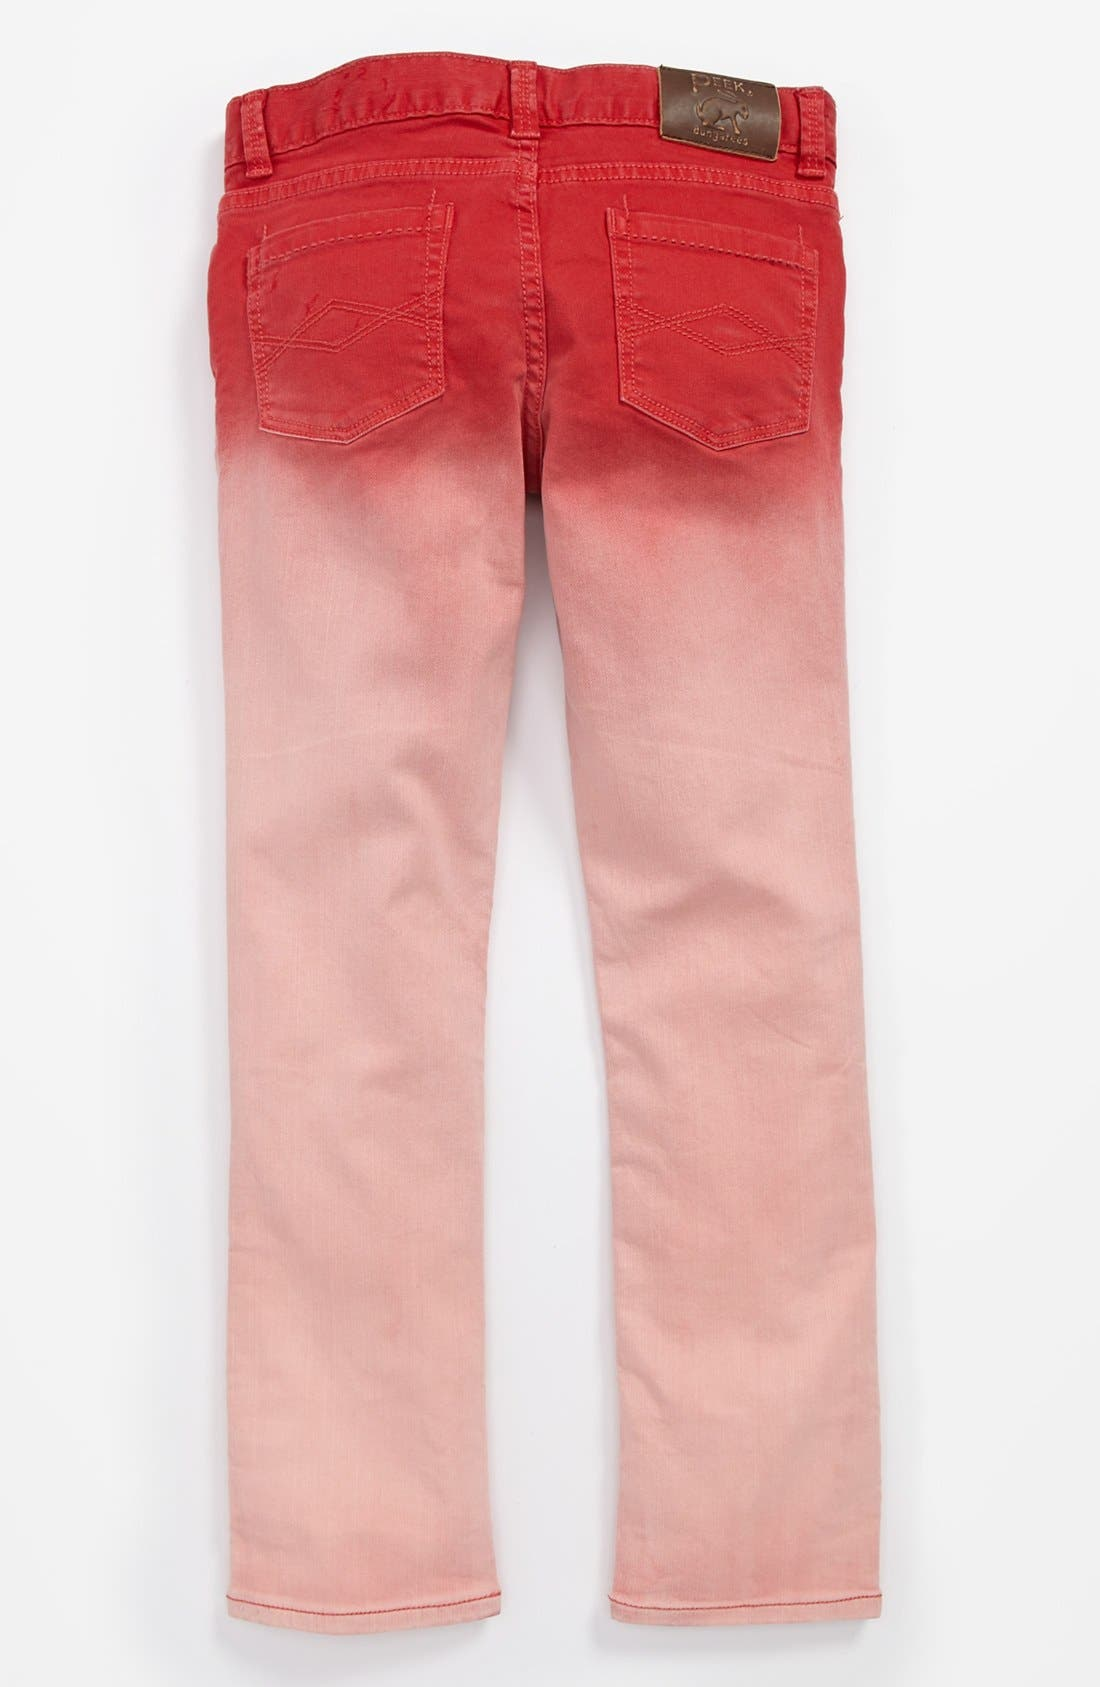 Alternate Image 1 Selected - Peek 'Dylan' Jeans (Toddler Girls, Little Girls & Big Girls)